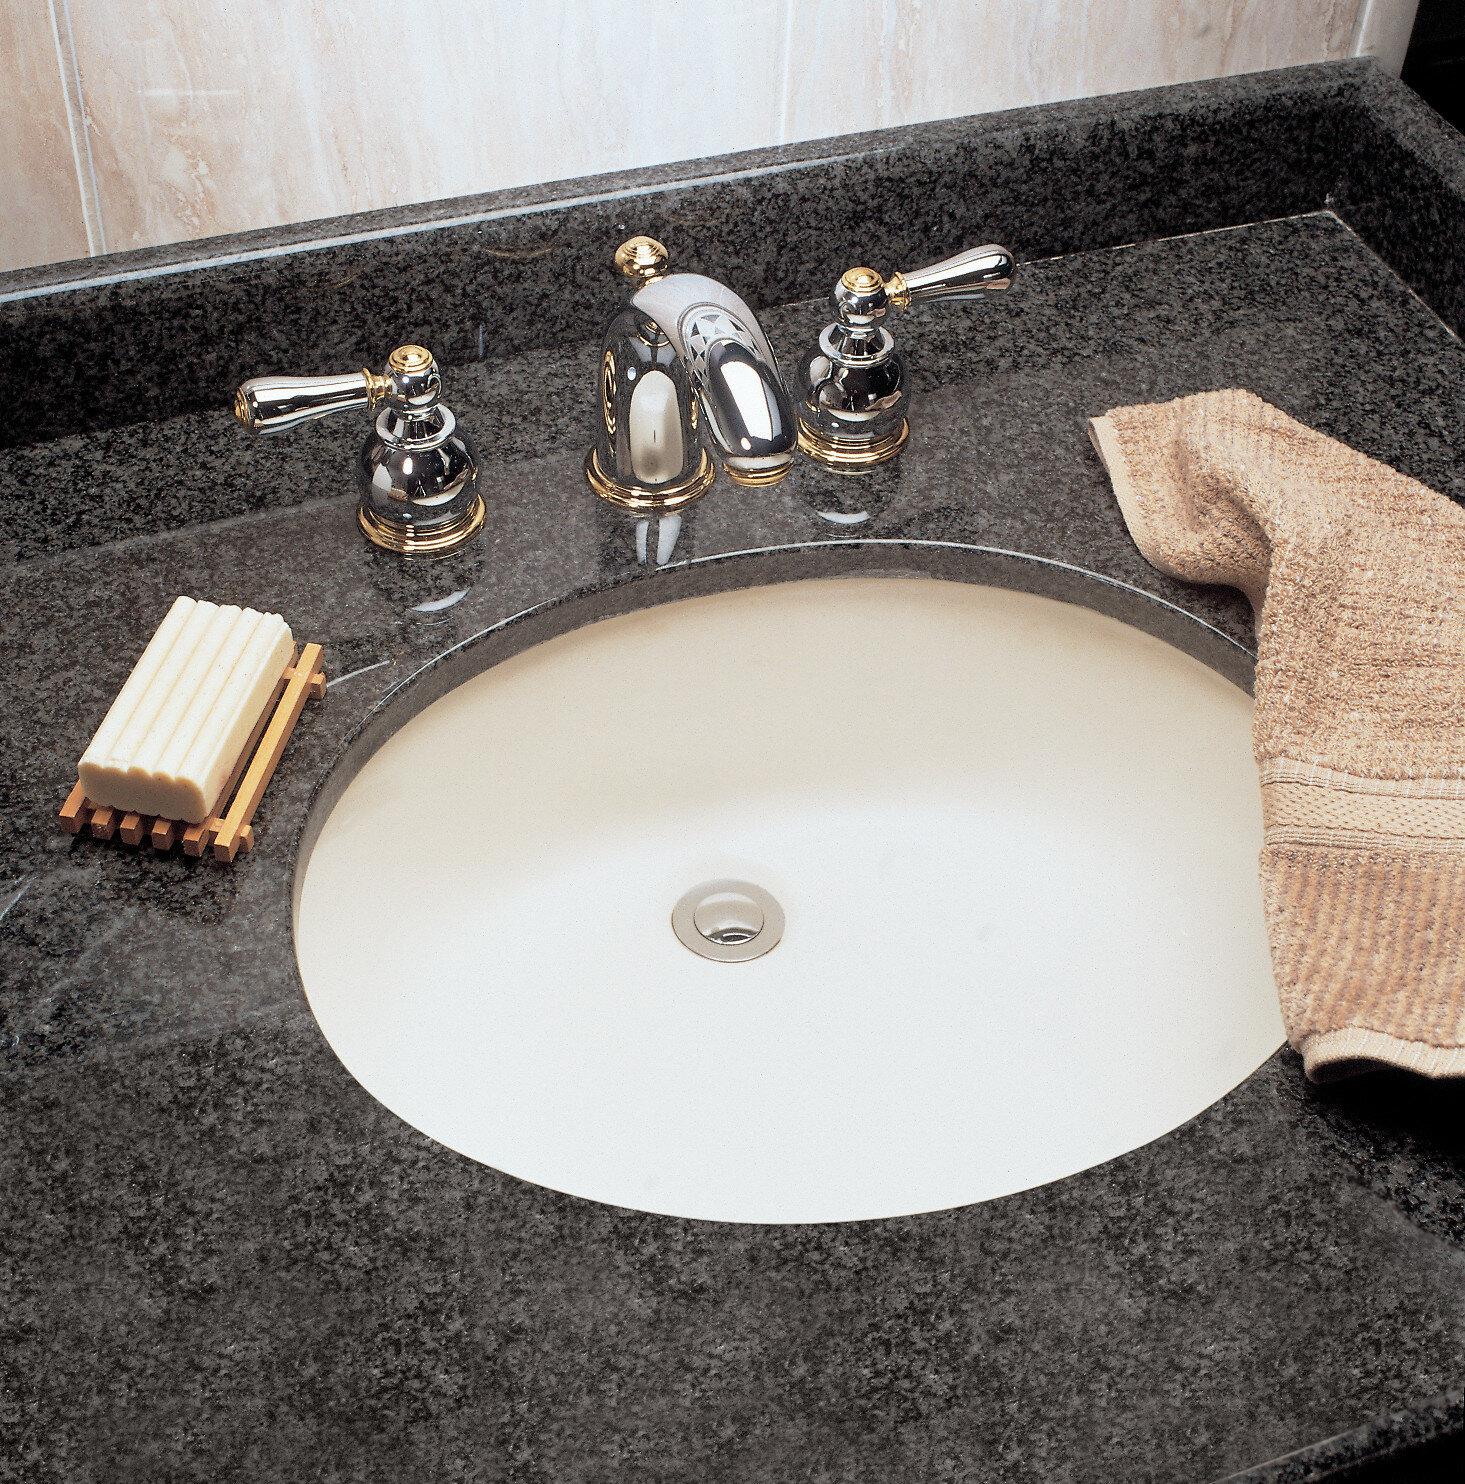 Superbe Ovalyn Ceramic Oval Undermount Bathroom Sink With Overflow